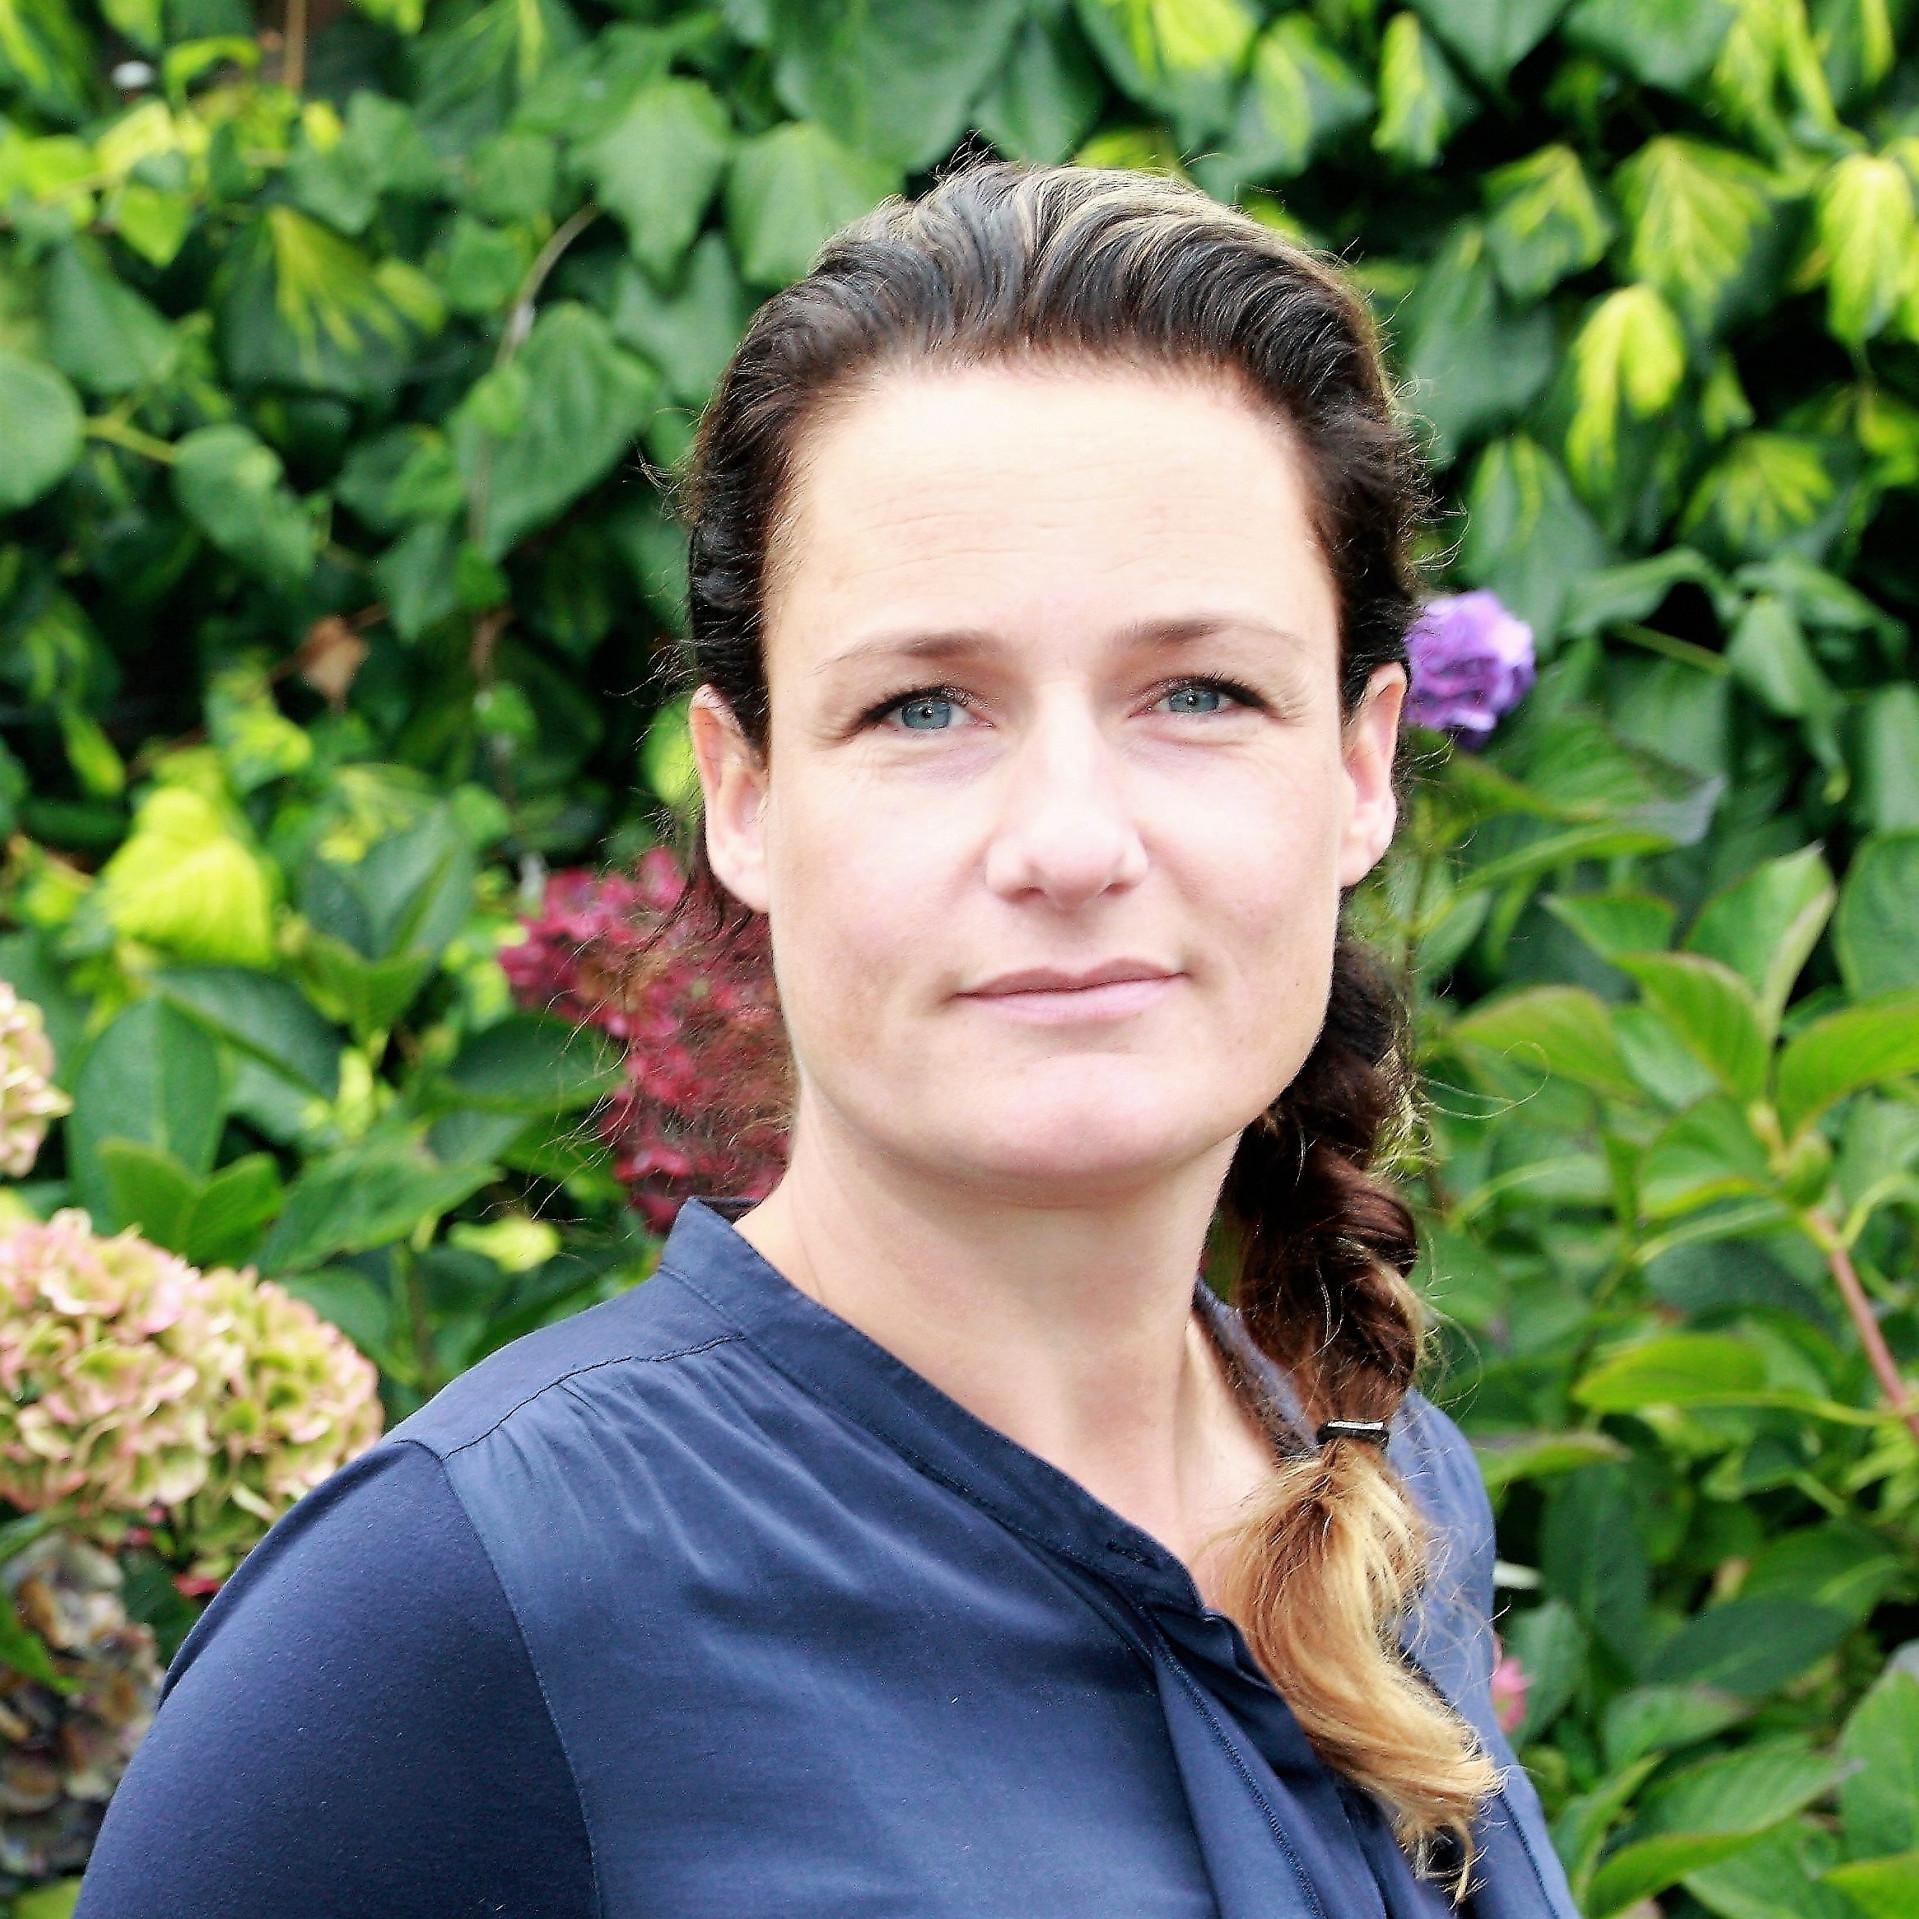 Chantal Vastenhout